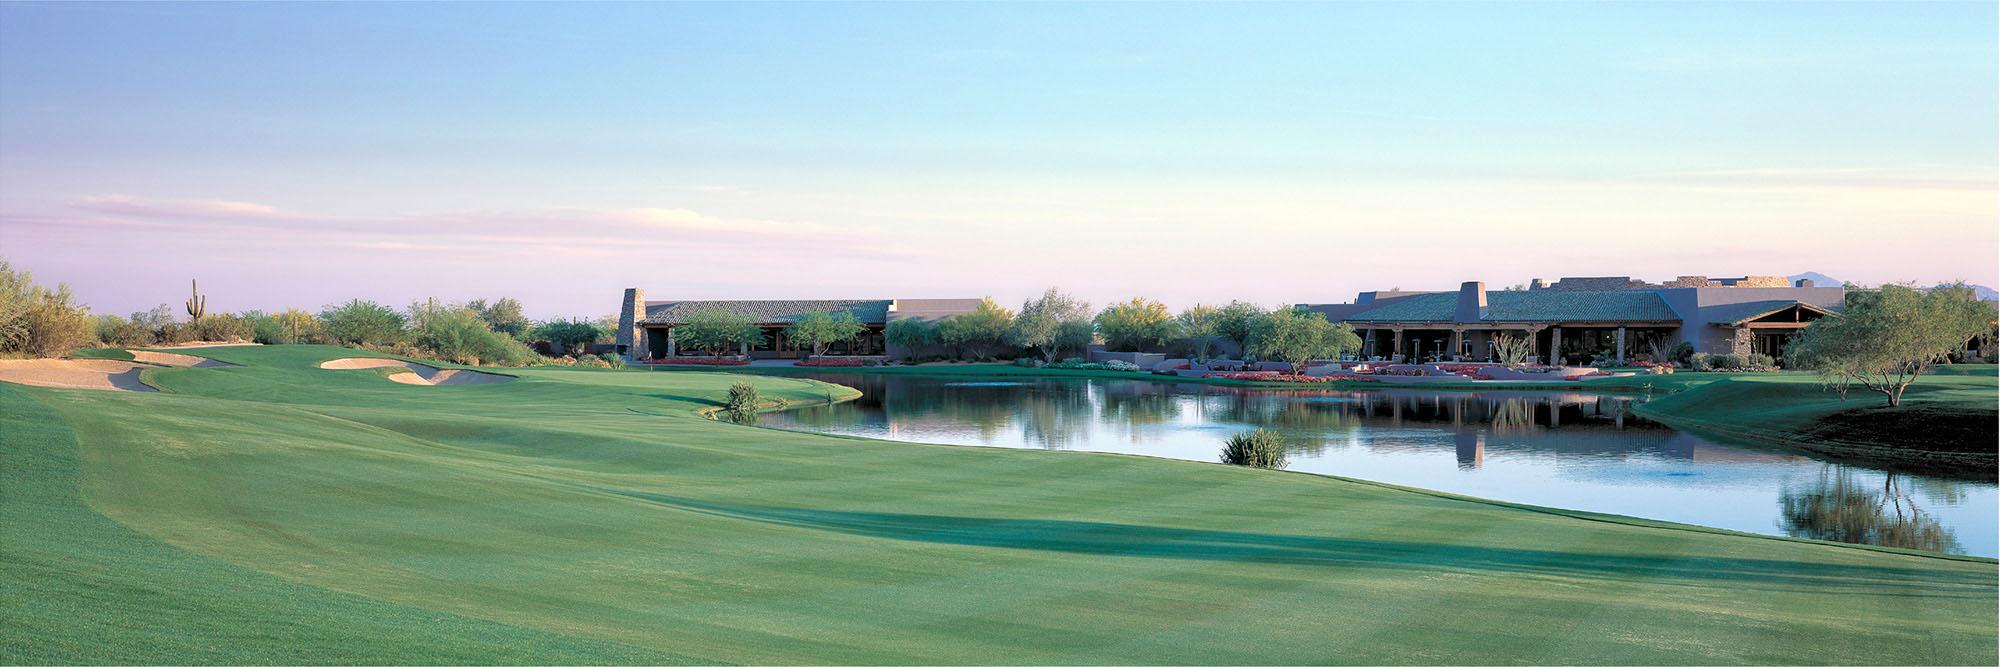 Golf Course Image - Grayhawk Raptor No. 18